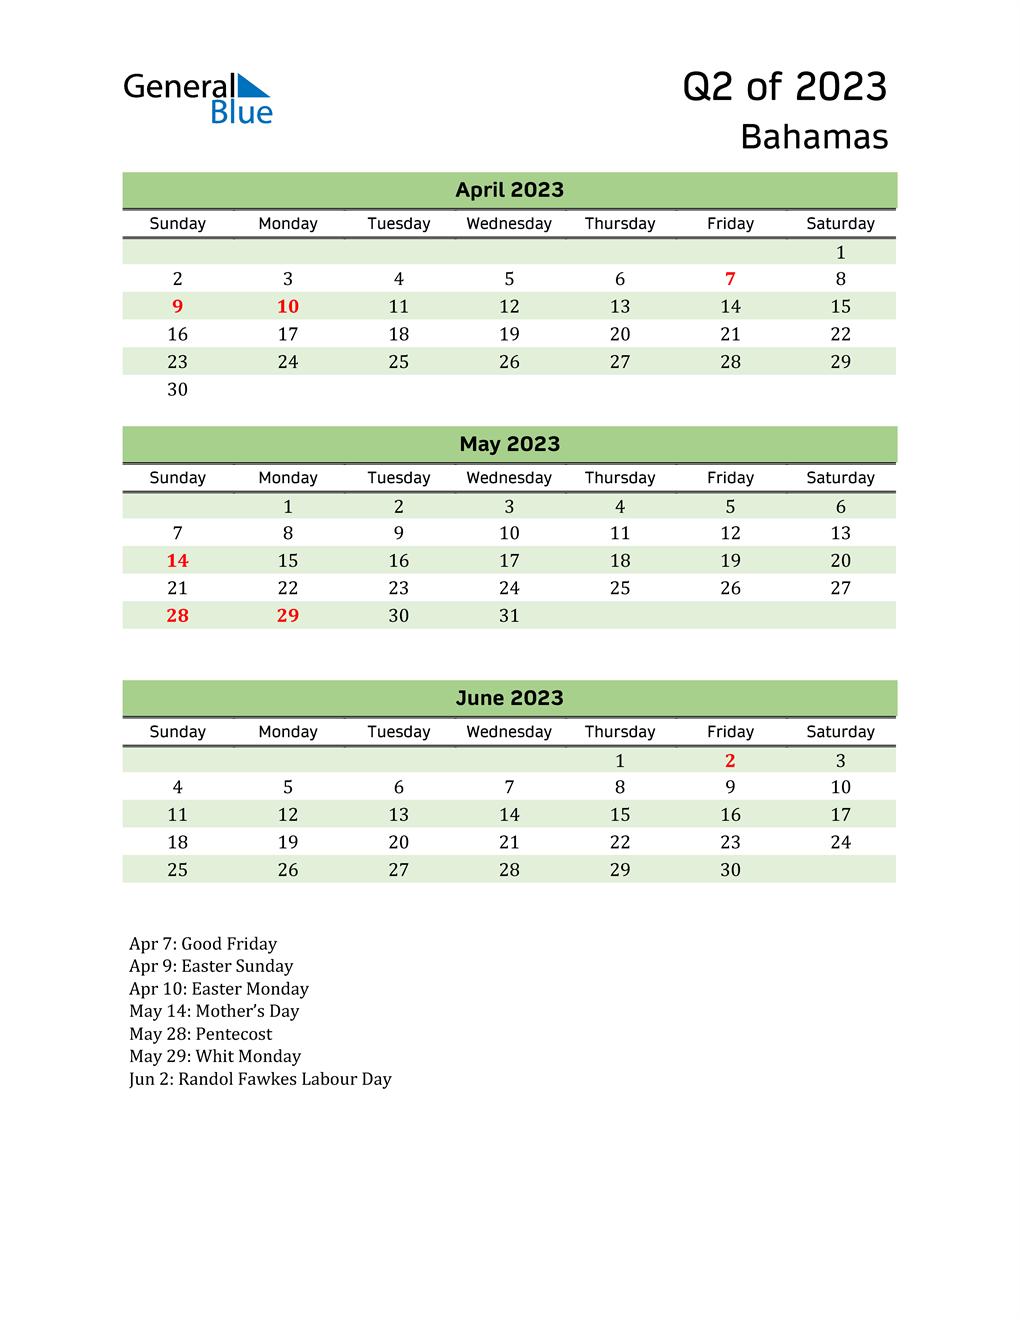 Quarterly Calendar 2023 with Bahamas Holidays